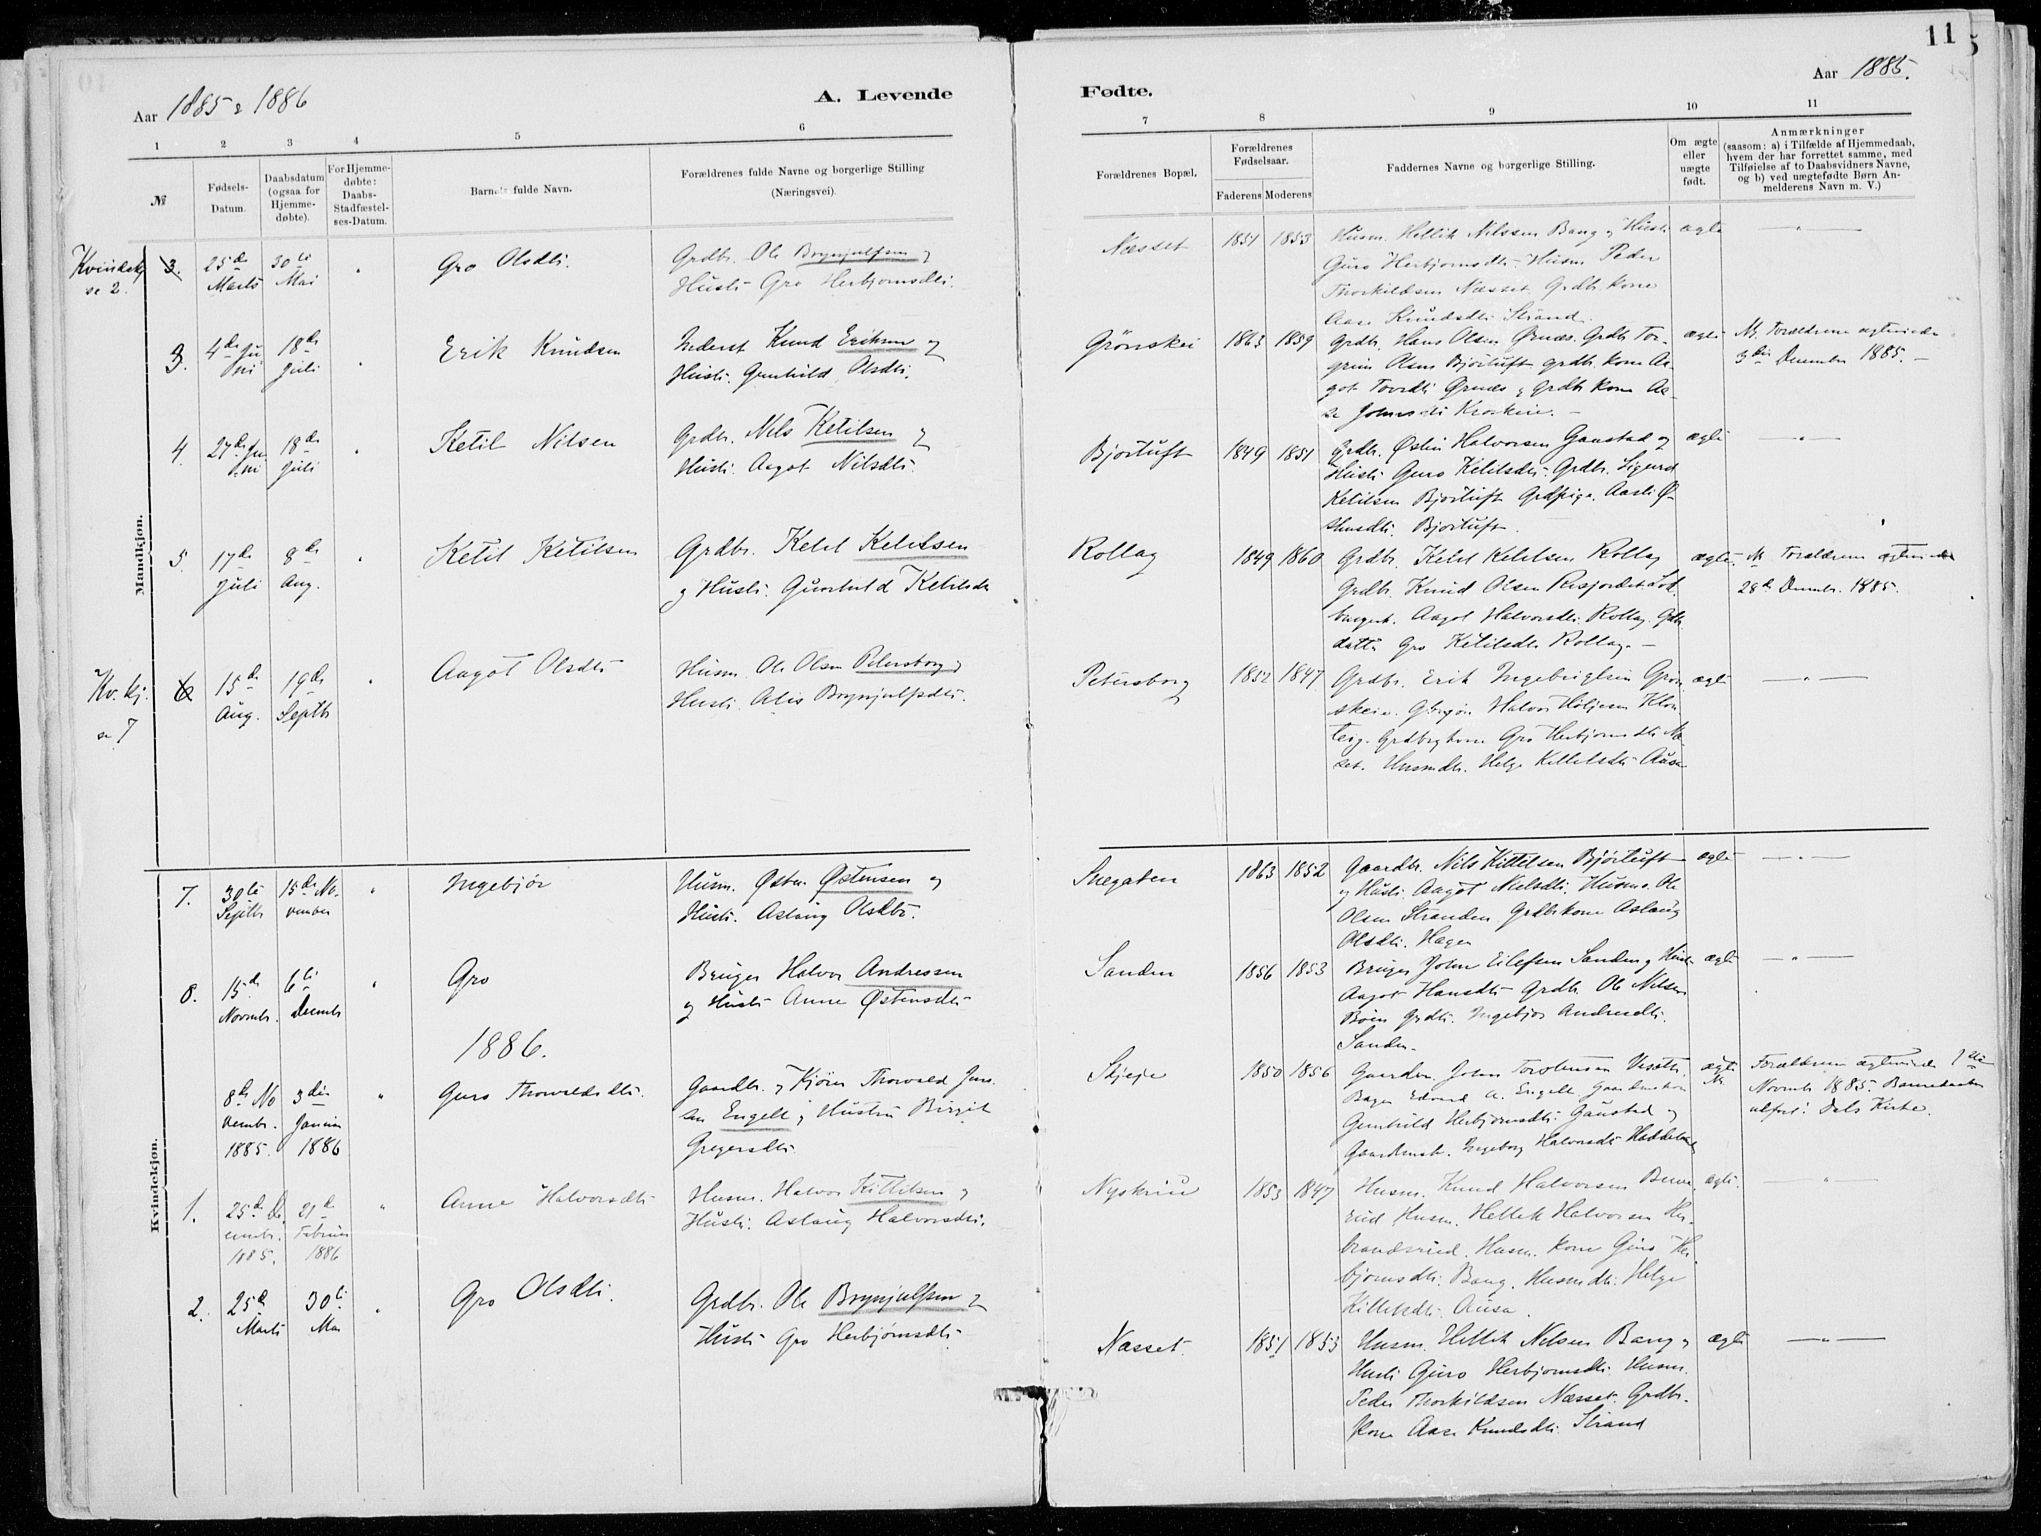 SAKO, Tinn kirkebøker, F/Fb/L0002: Ministerialbok nr. II 2, 1878-1917, s. 11